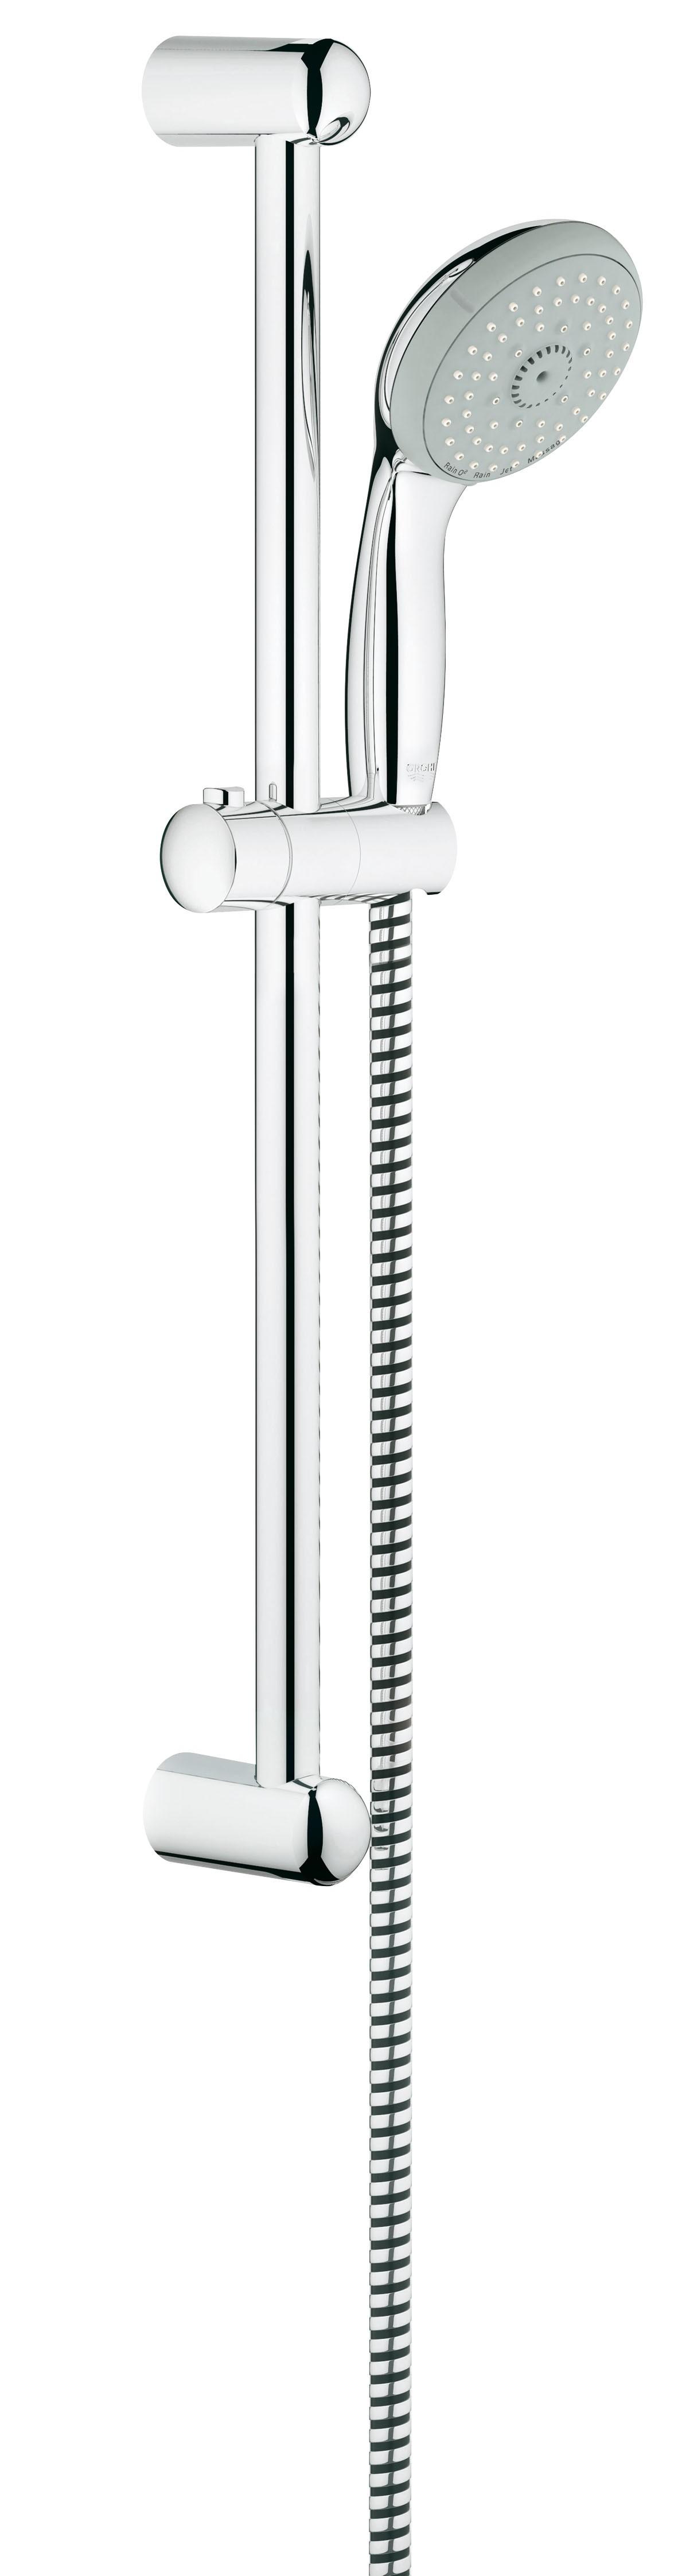 Grohe 27795000 Tempesta Classic (ручной душ, штанга 600 мм, шланг 1750 мм), хром